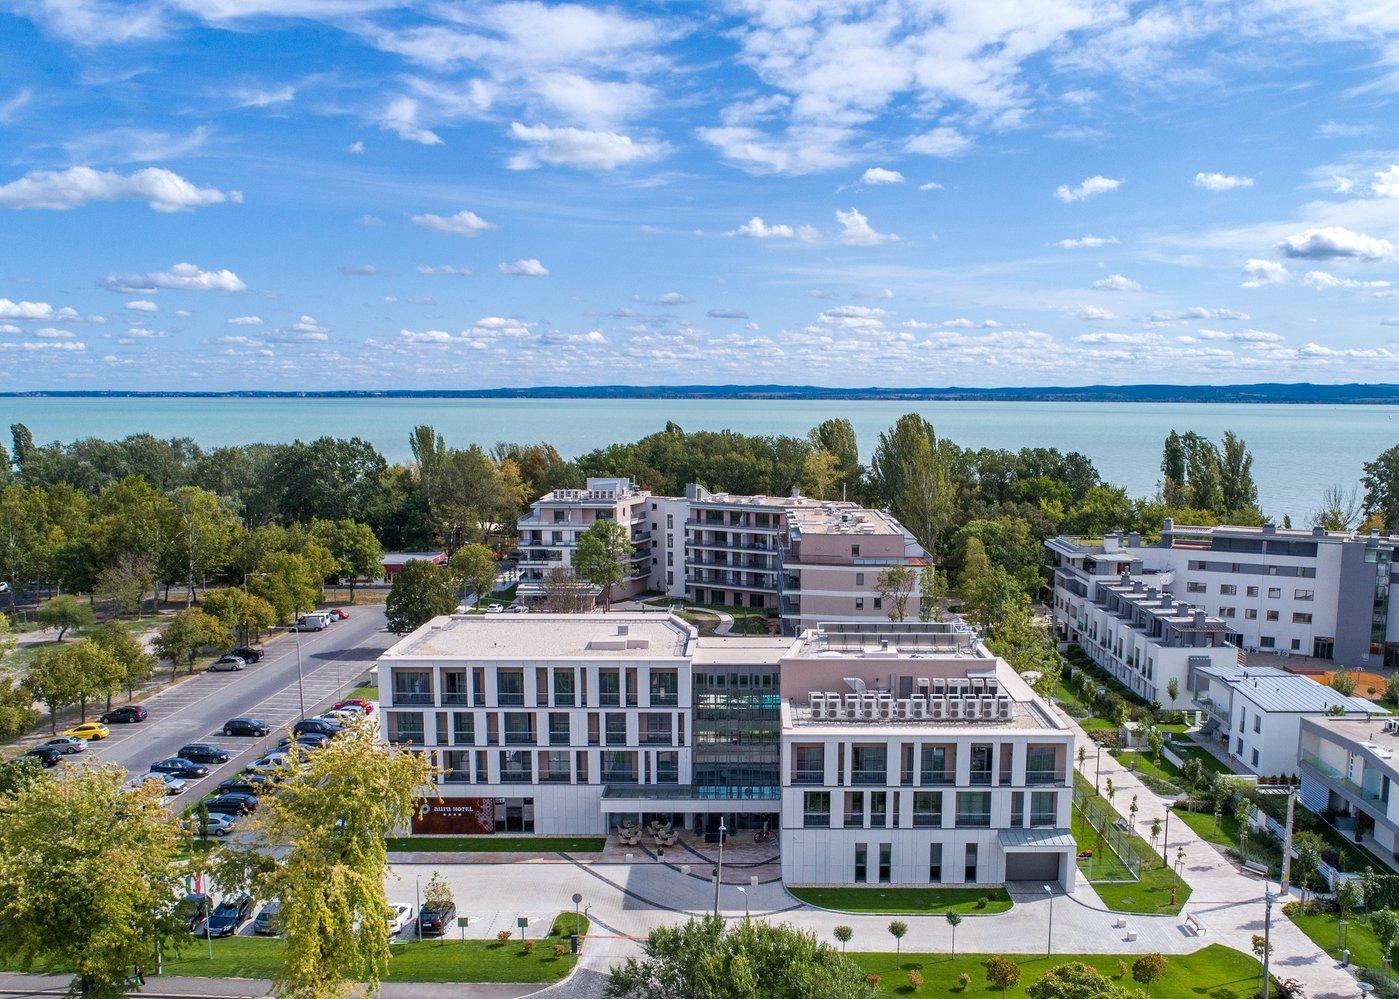 Cover image of Aura Hotel Balatonfüred